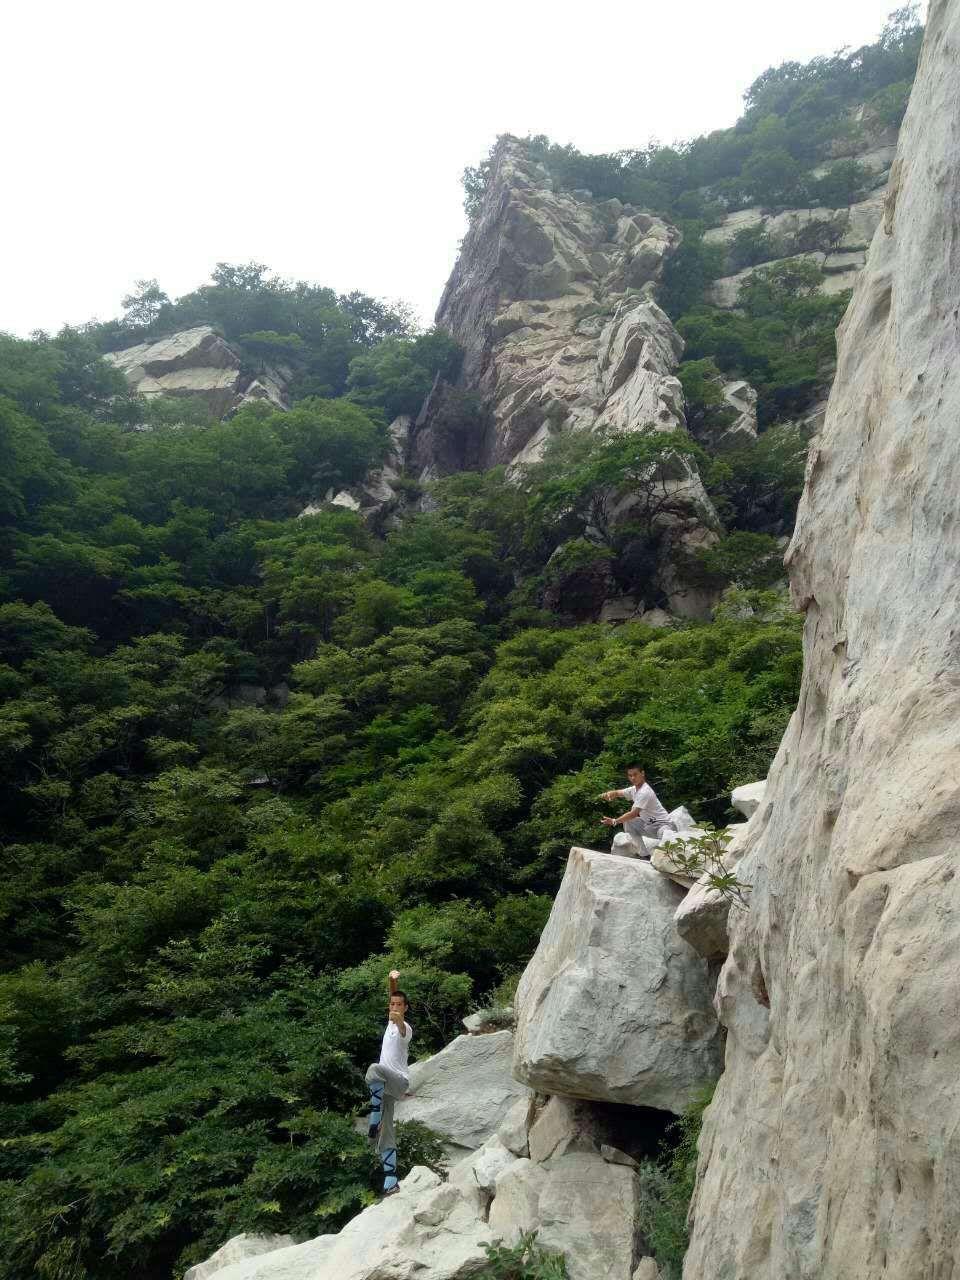 Colorado Kung Fu Demo Team Captains at the Shaolin Temple. (Shi Miao Jie & Shi Miao Da)